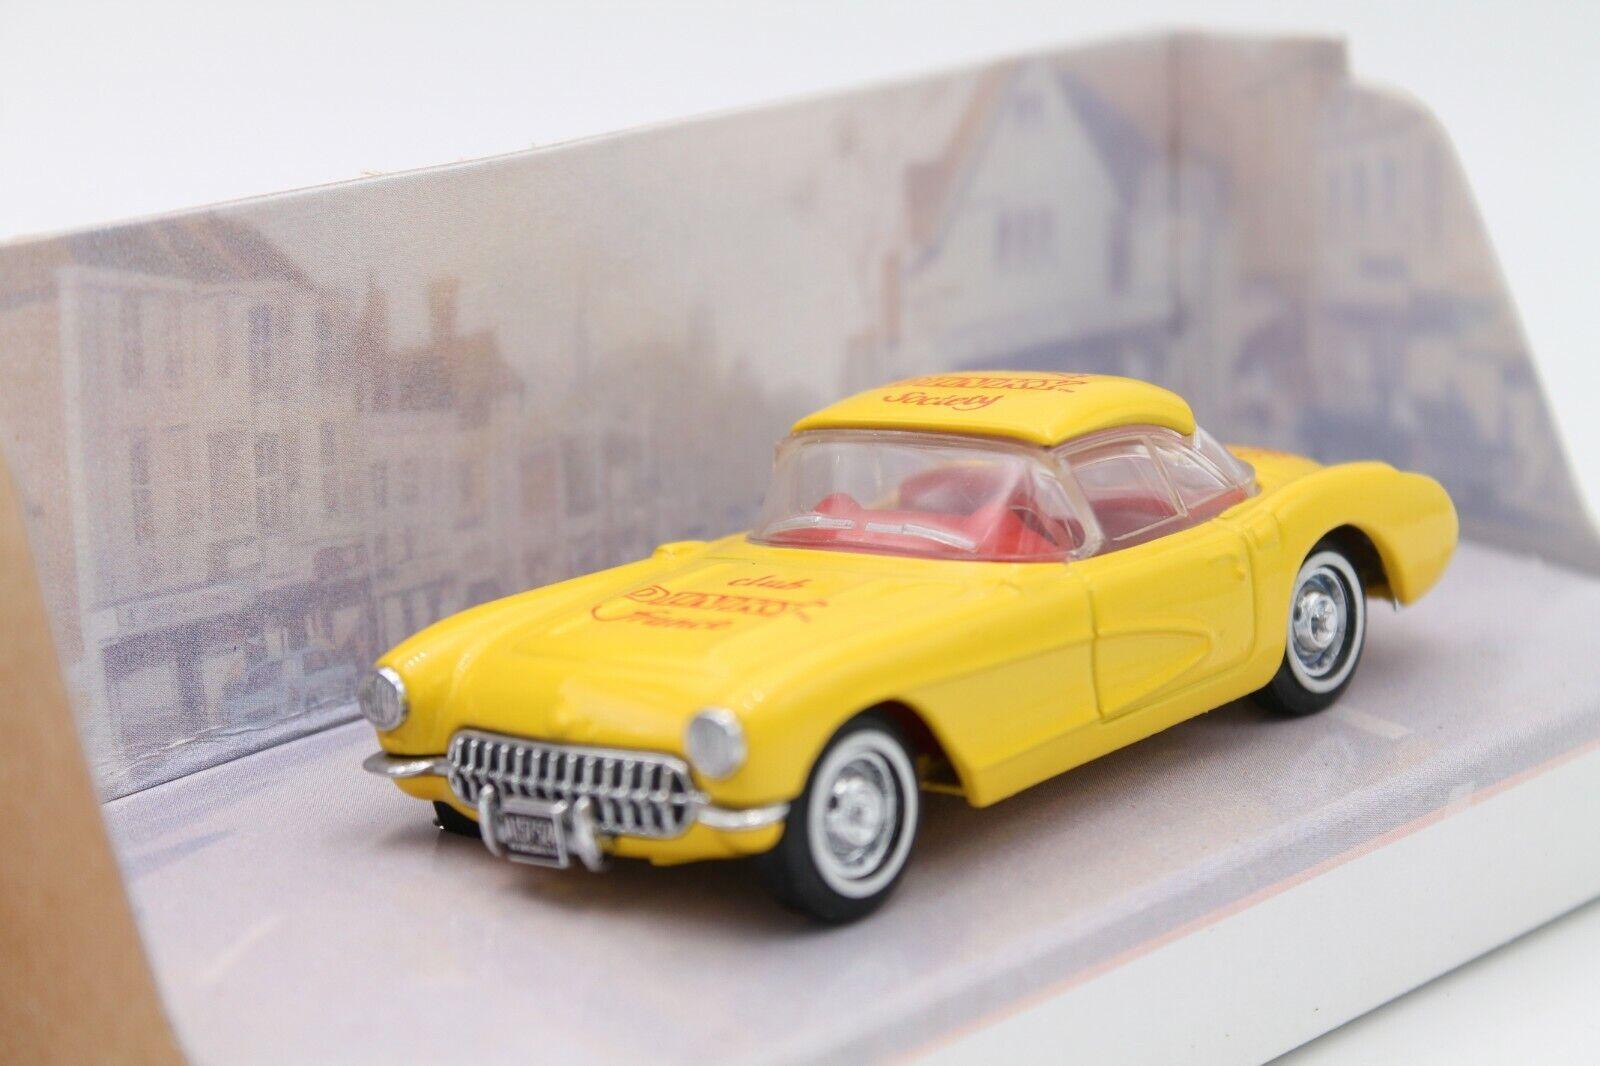 Dinky Toys  56 Chevrolet Corvette  Dinky Society 1993  Limited